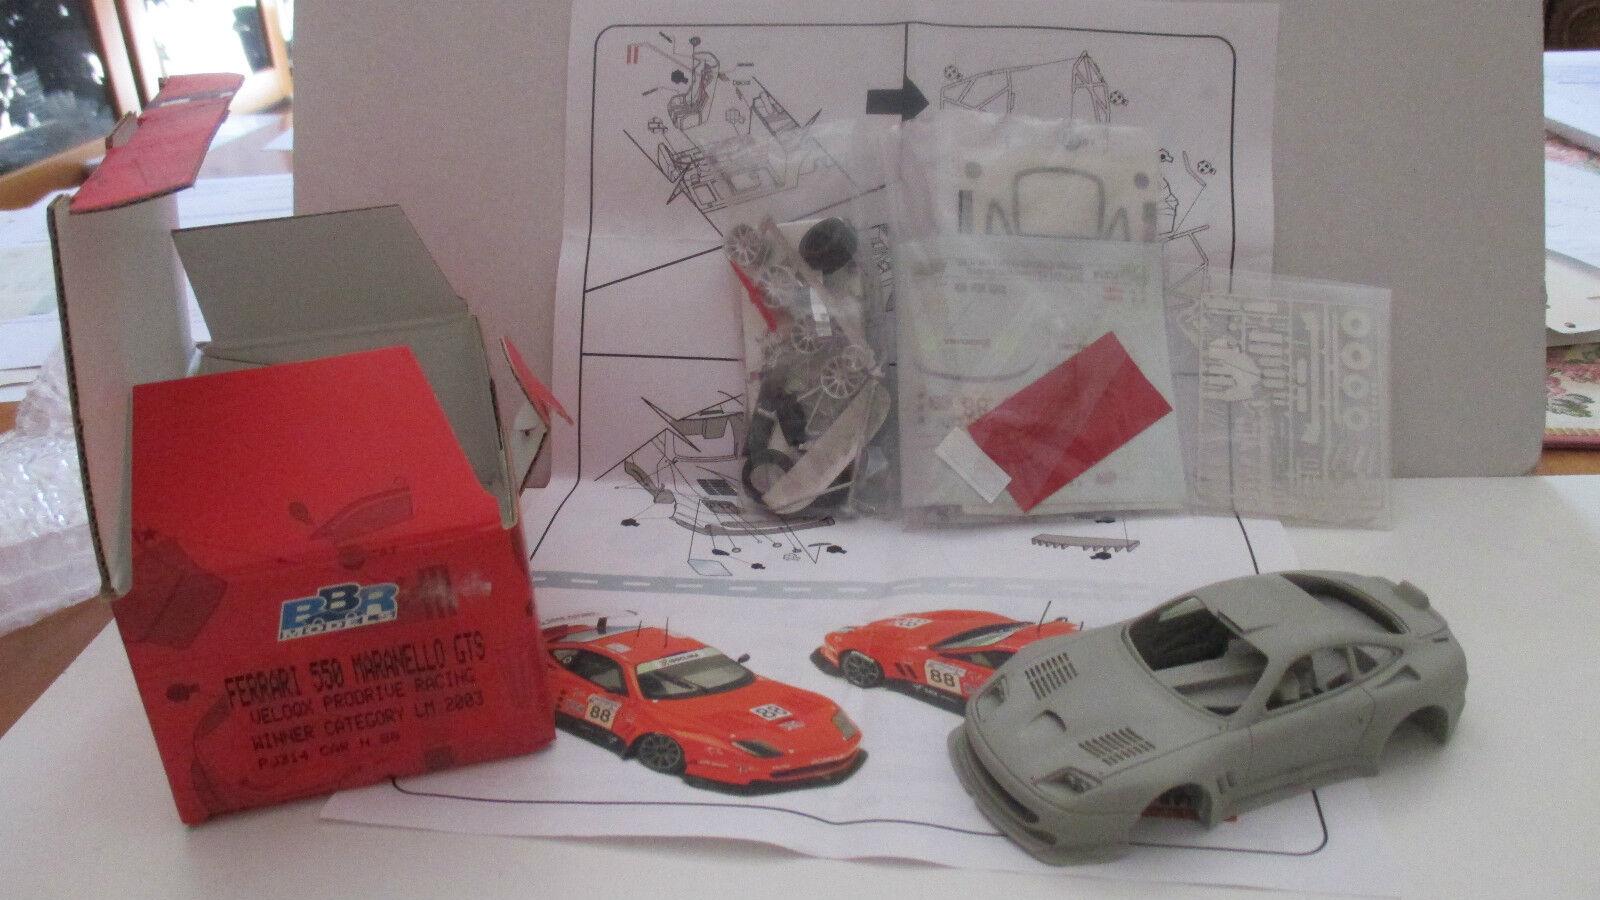 FERRARI 550 MARANELLO GTS VELOQX PRODRIVE RACING 2003 BY BY BY BBR 1 43 PJ314 74b9ae